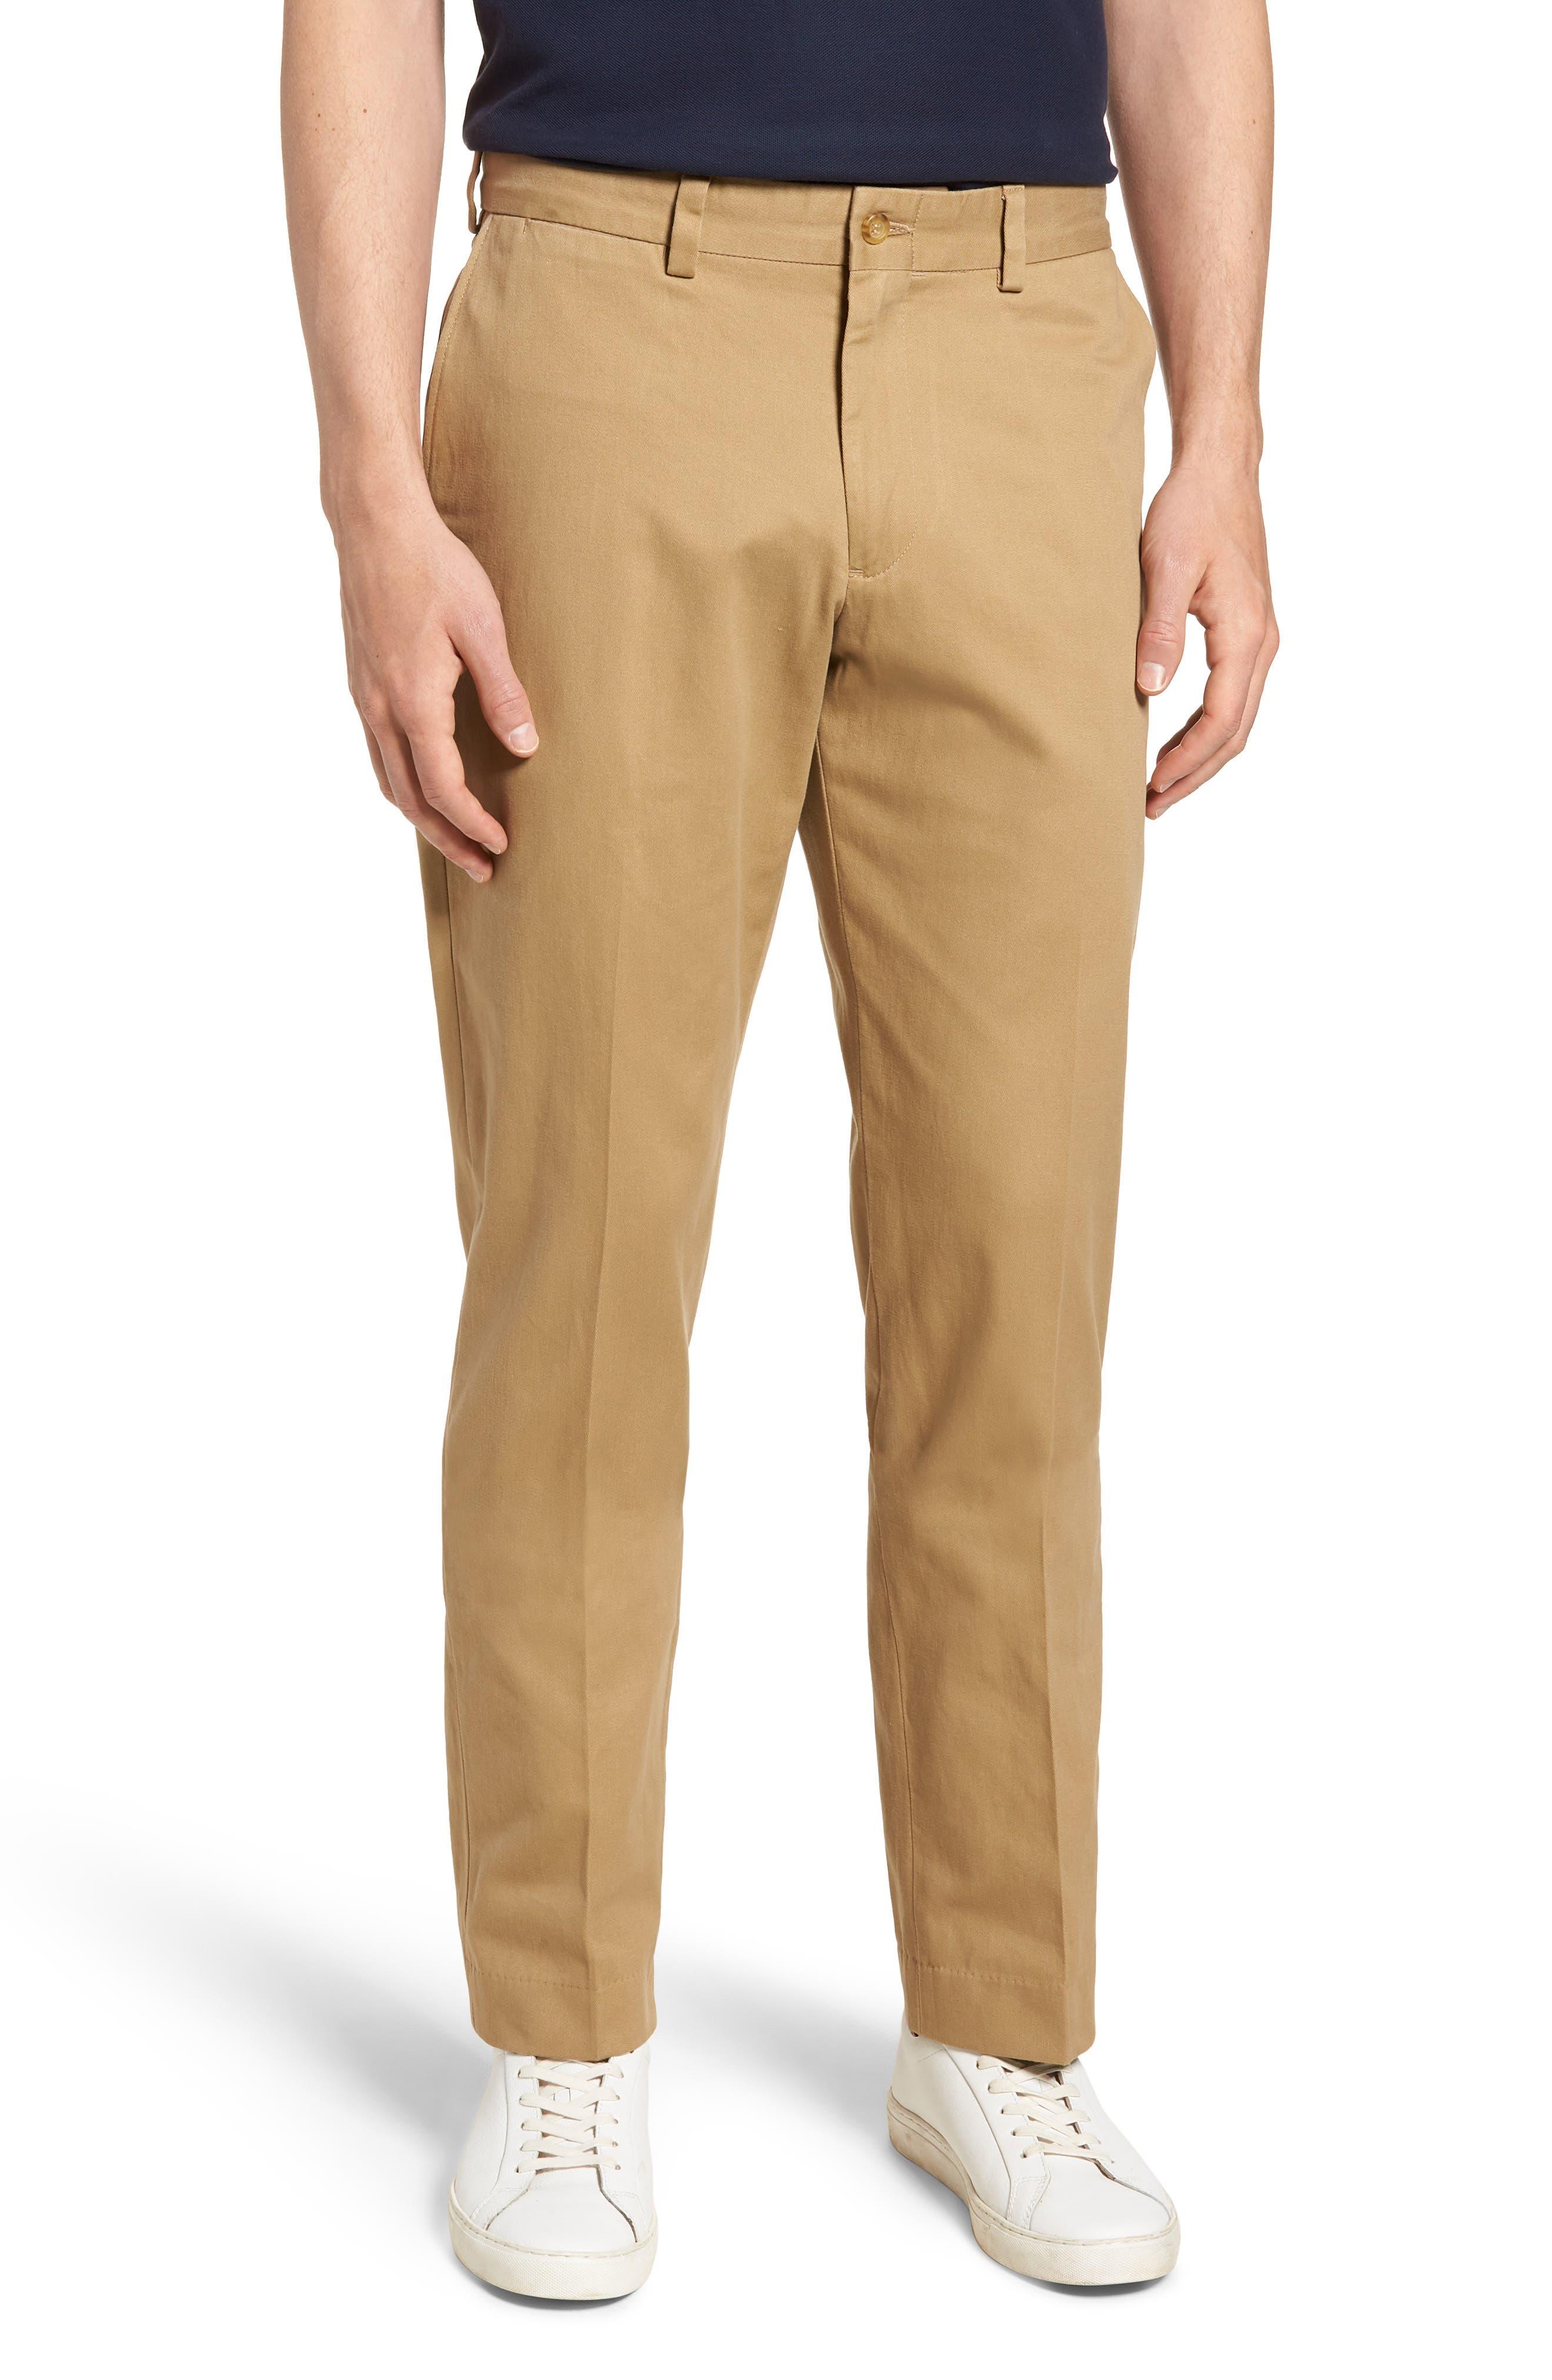 M3 Straight Fit Vintage Twill Flat Front Pants,                             Main thumbnail 1, color,                             British Khaki